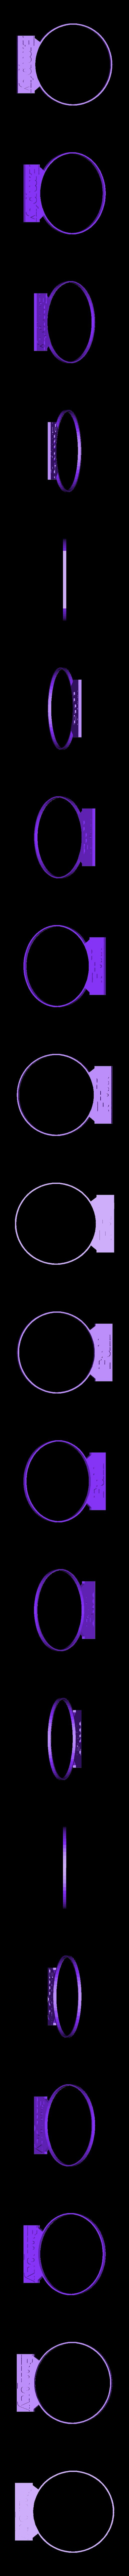 gas_tank_ring_Emptyfull.stl Download free STL file Gas tank ring Empty/full • 3D print template, idy26